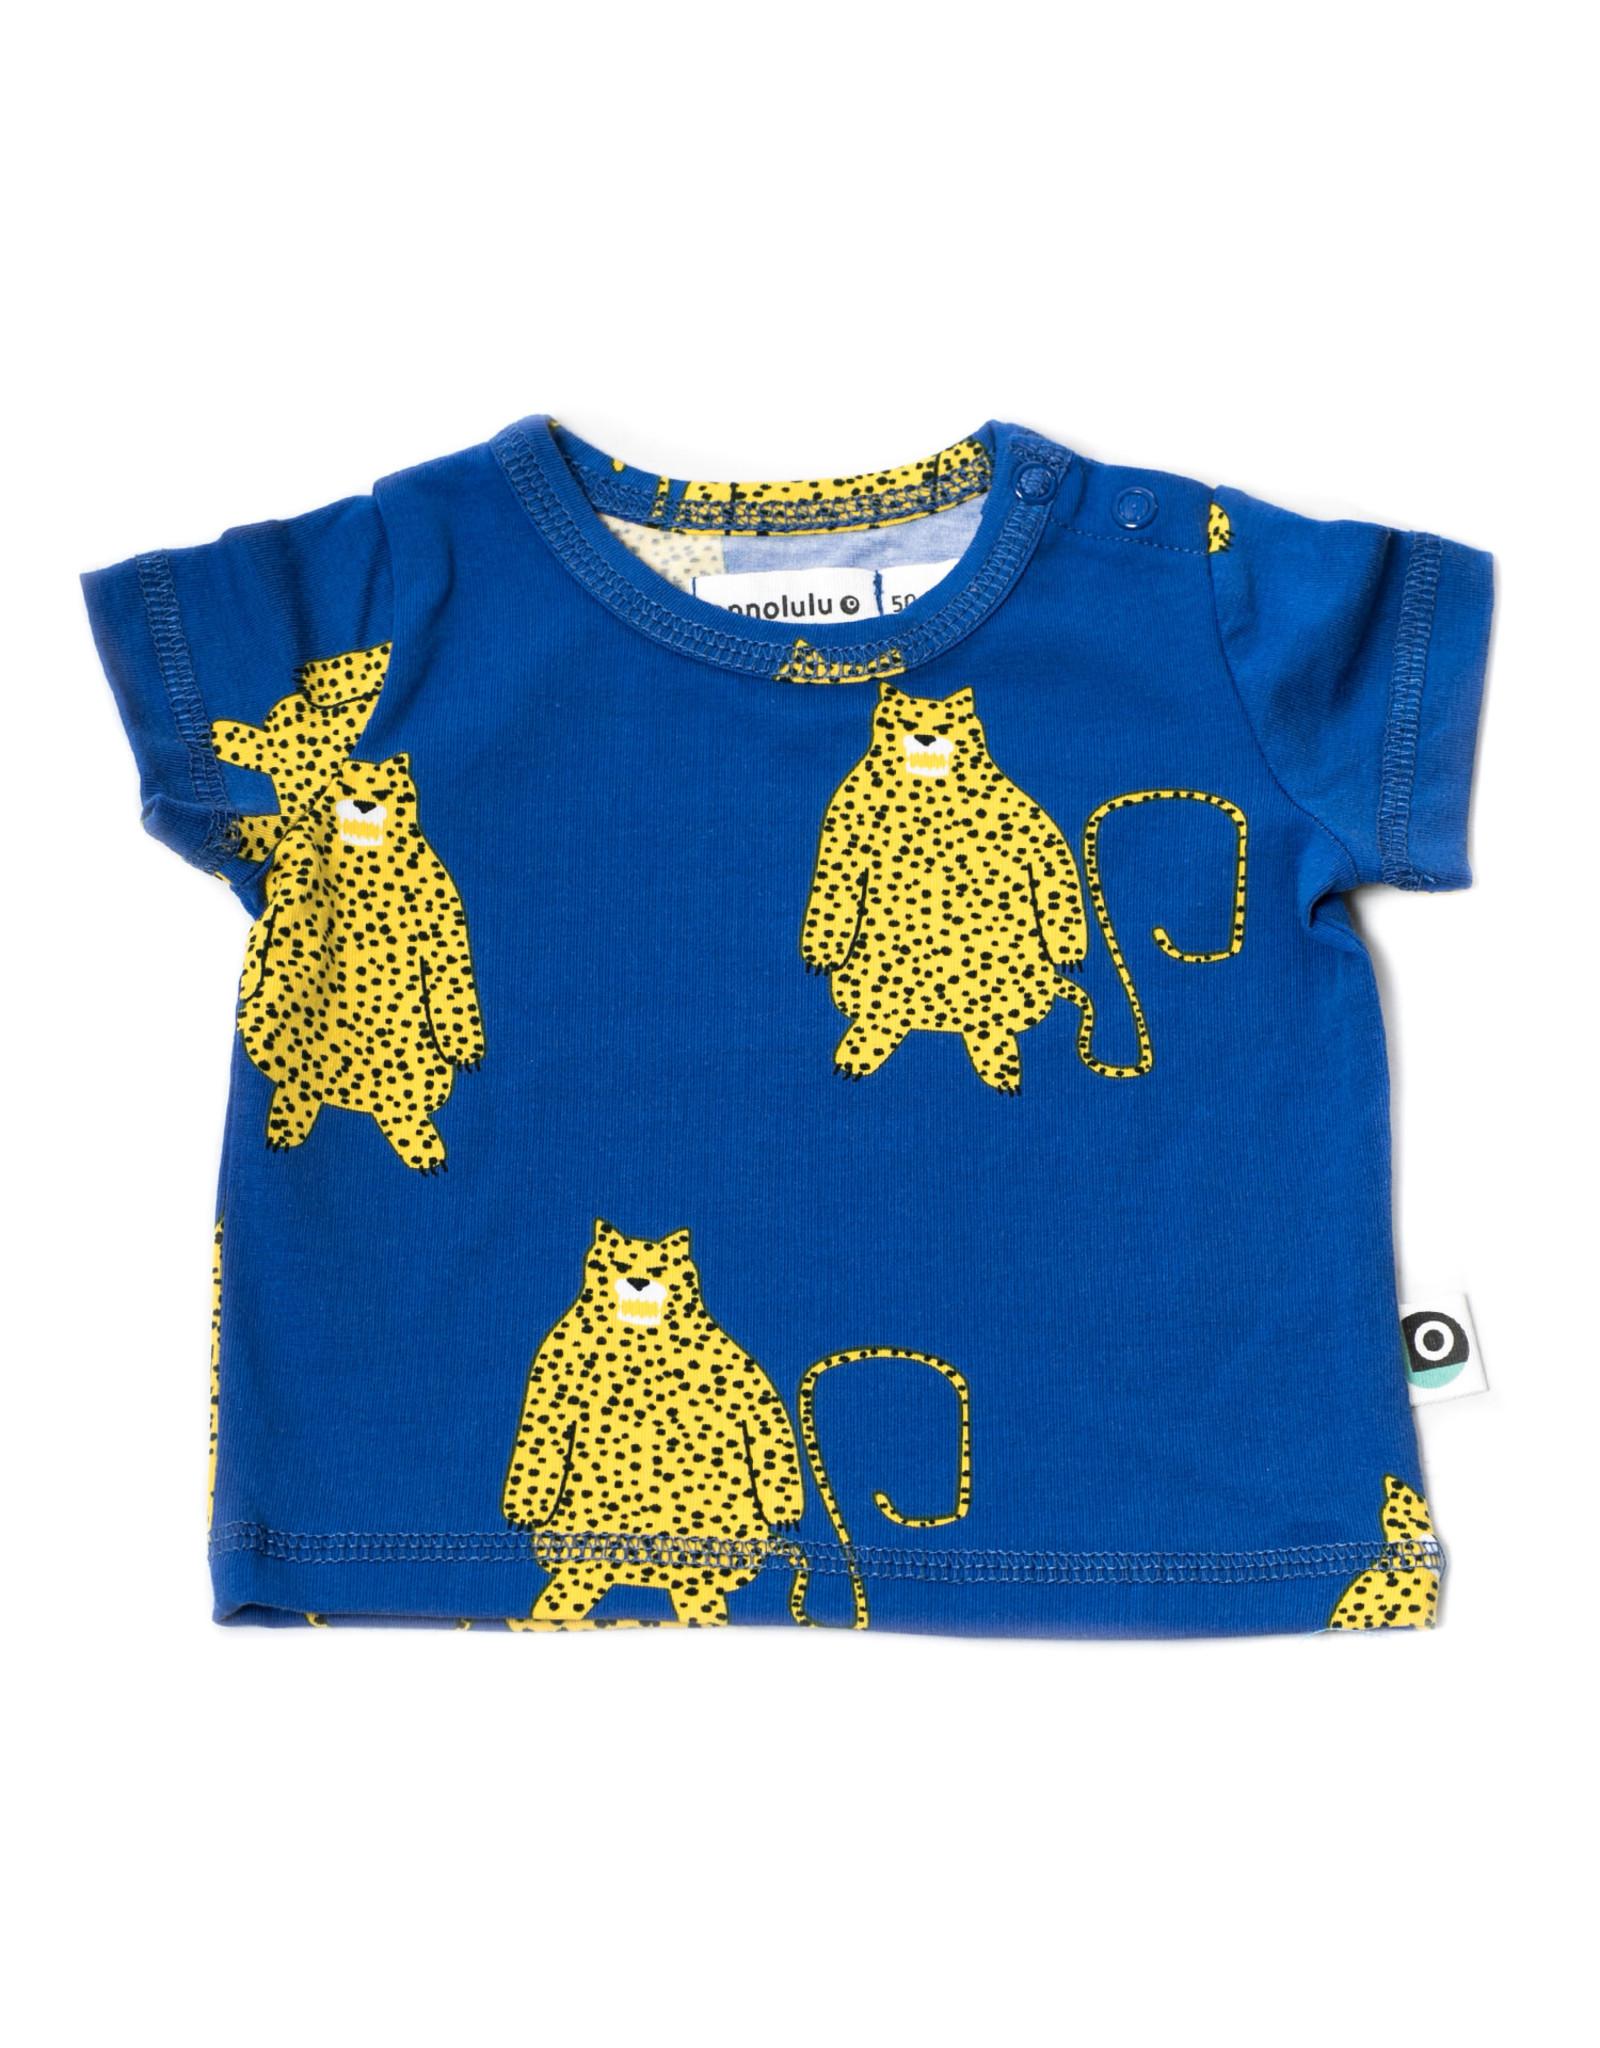 Onnolulu Onnolulu shirt Emi Leopard jersey cotton